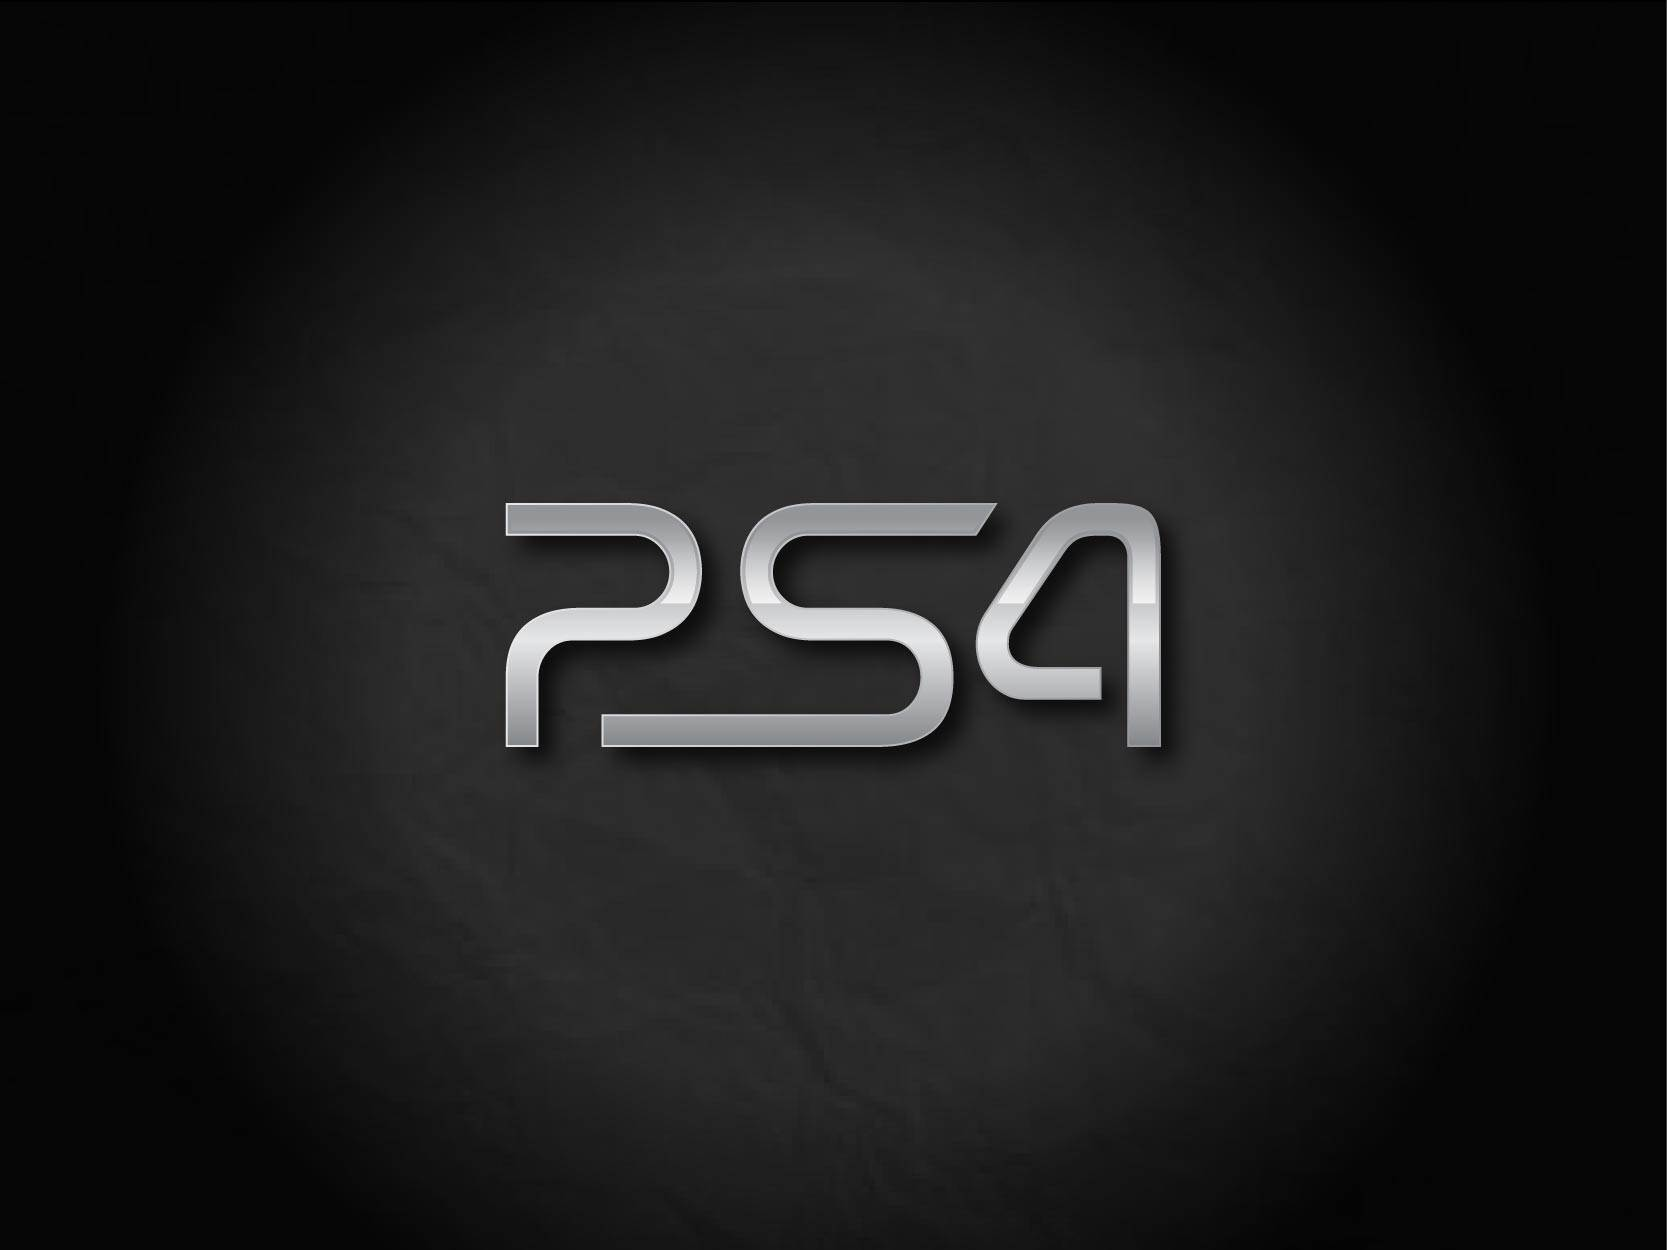 ps4-logo-1